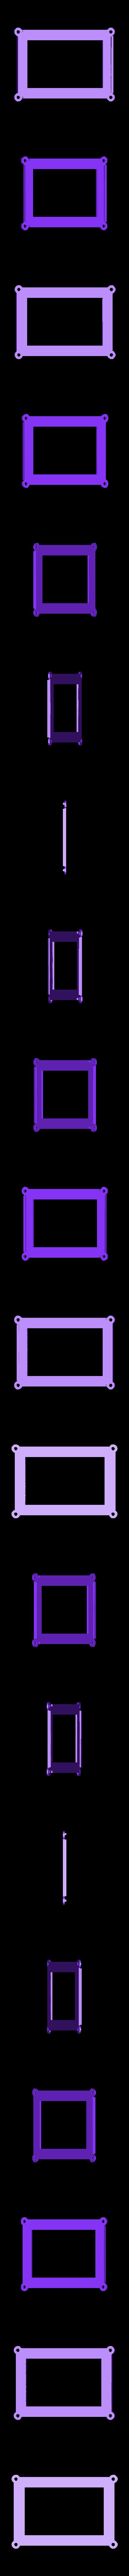 lid2.stl Download free SCAD file Modular raspberry pi case • 3D print object, Lassaalk